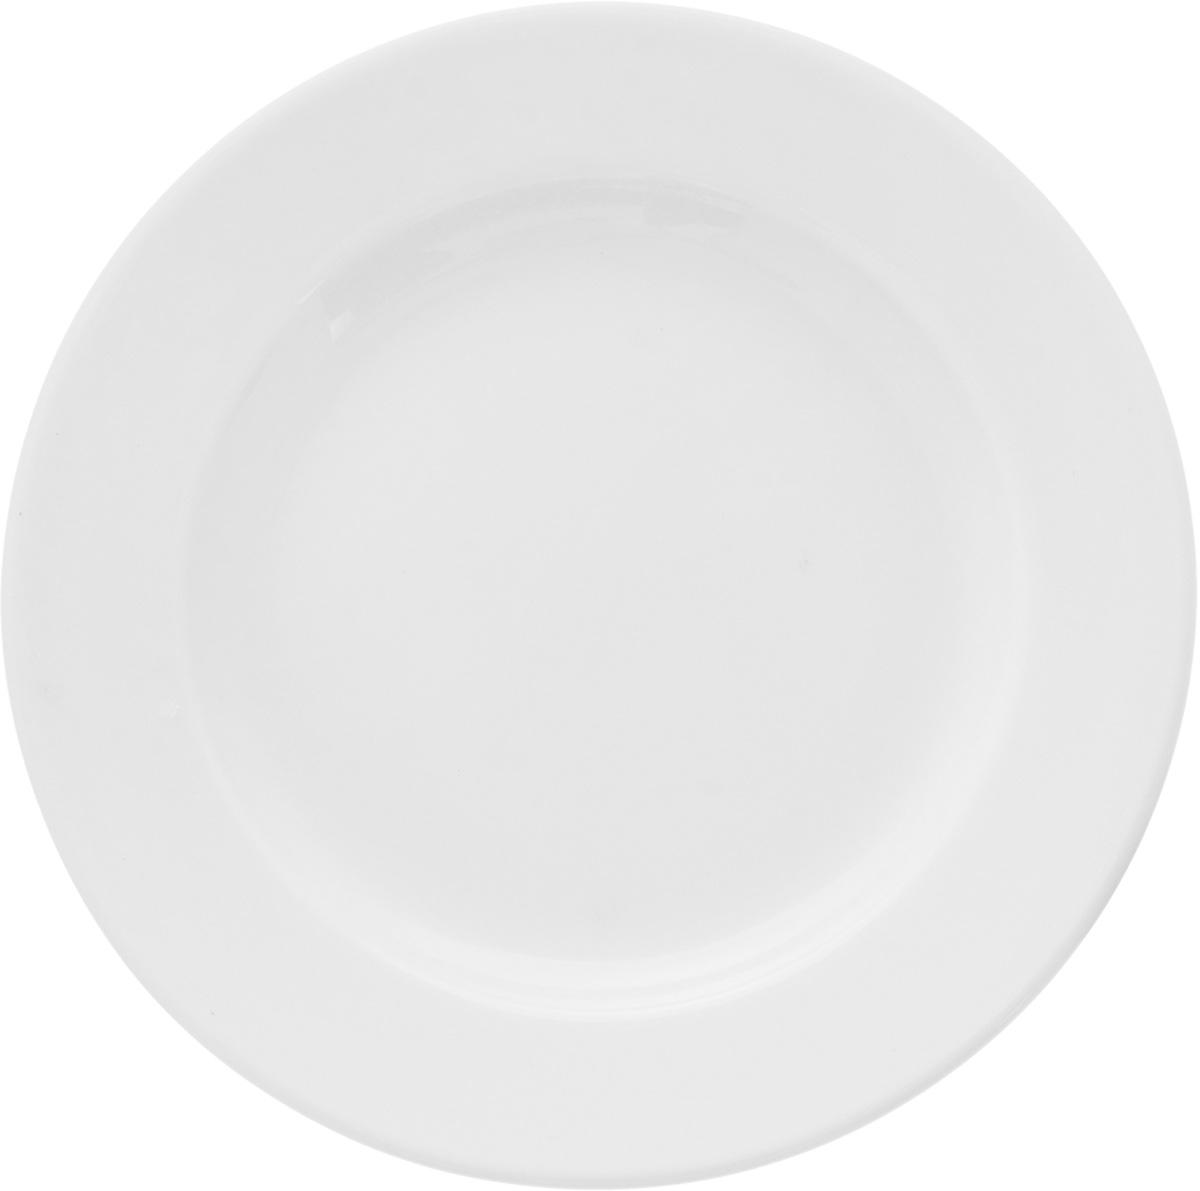 Тарелка мелкая Ariane Прайм, диаметр 14,5 см